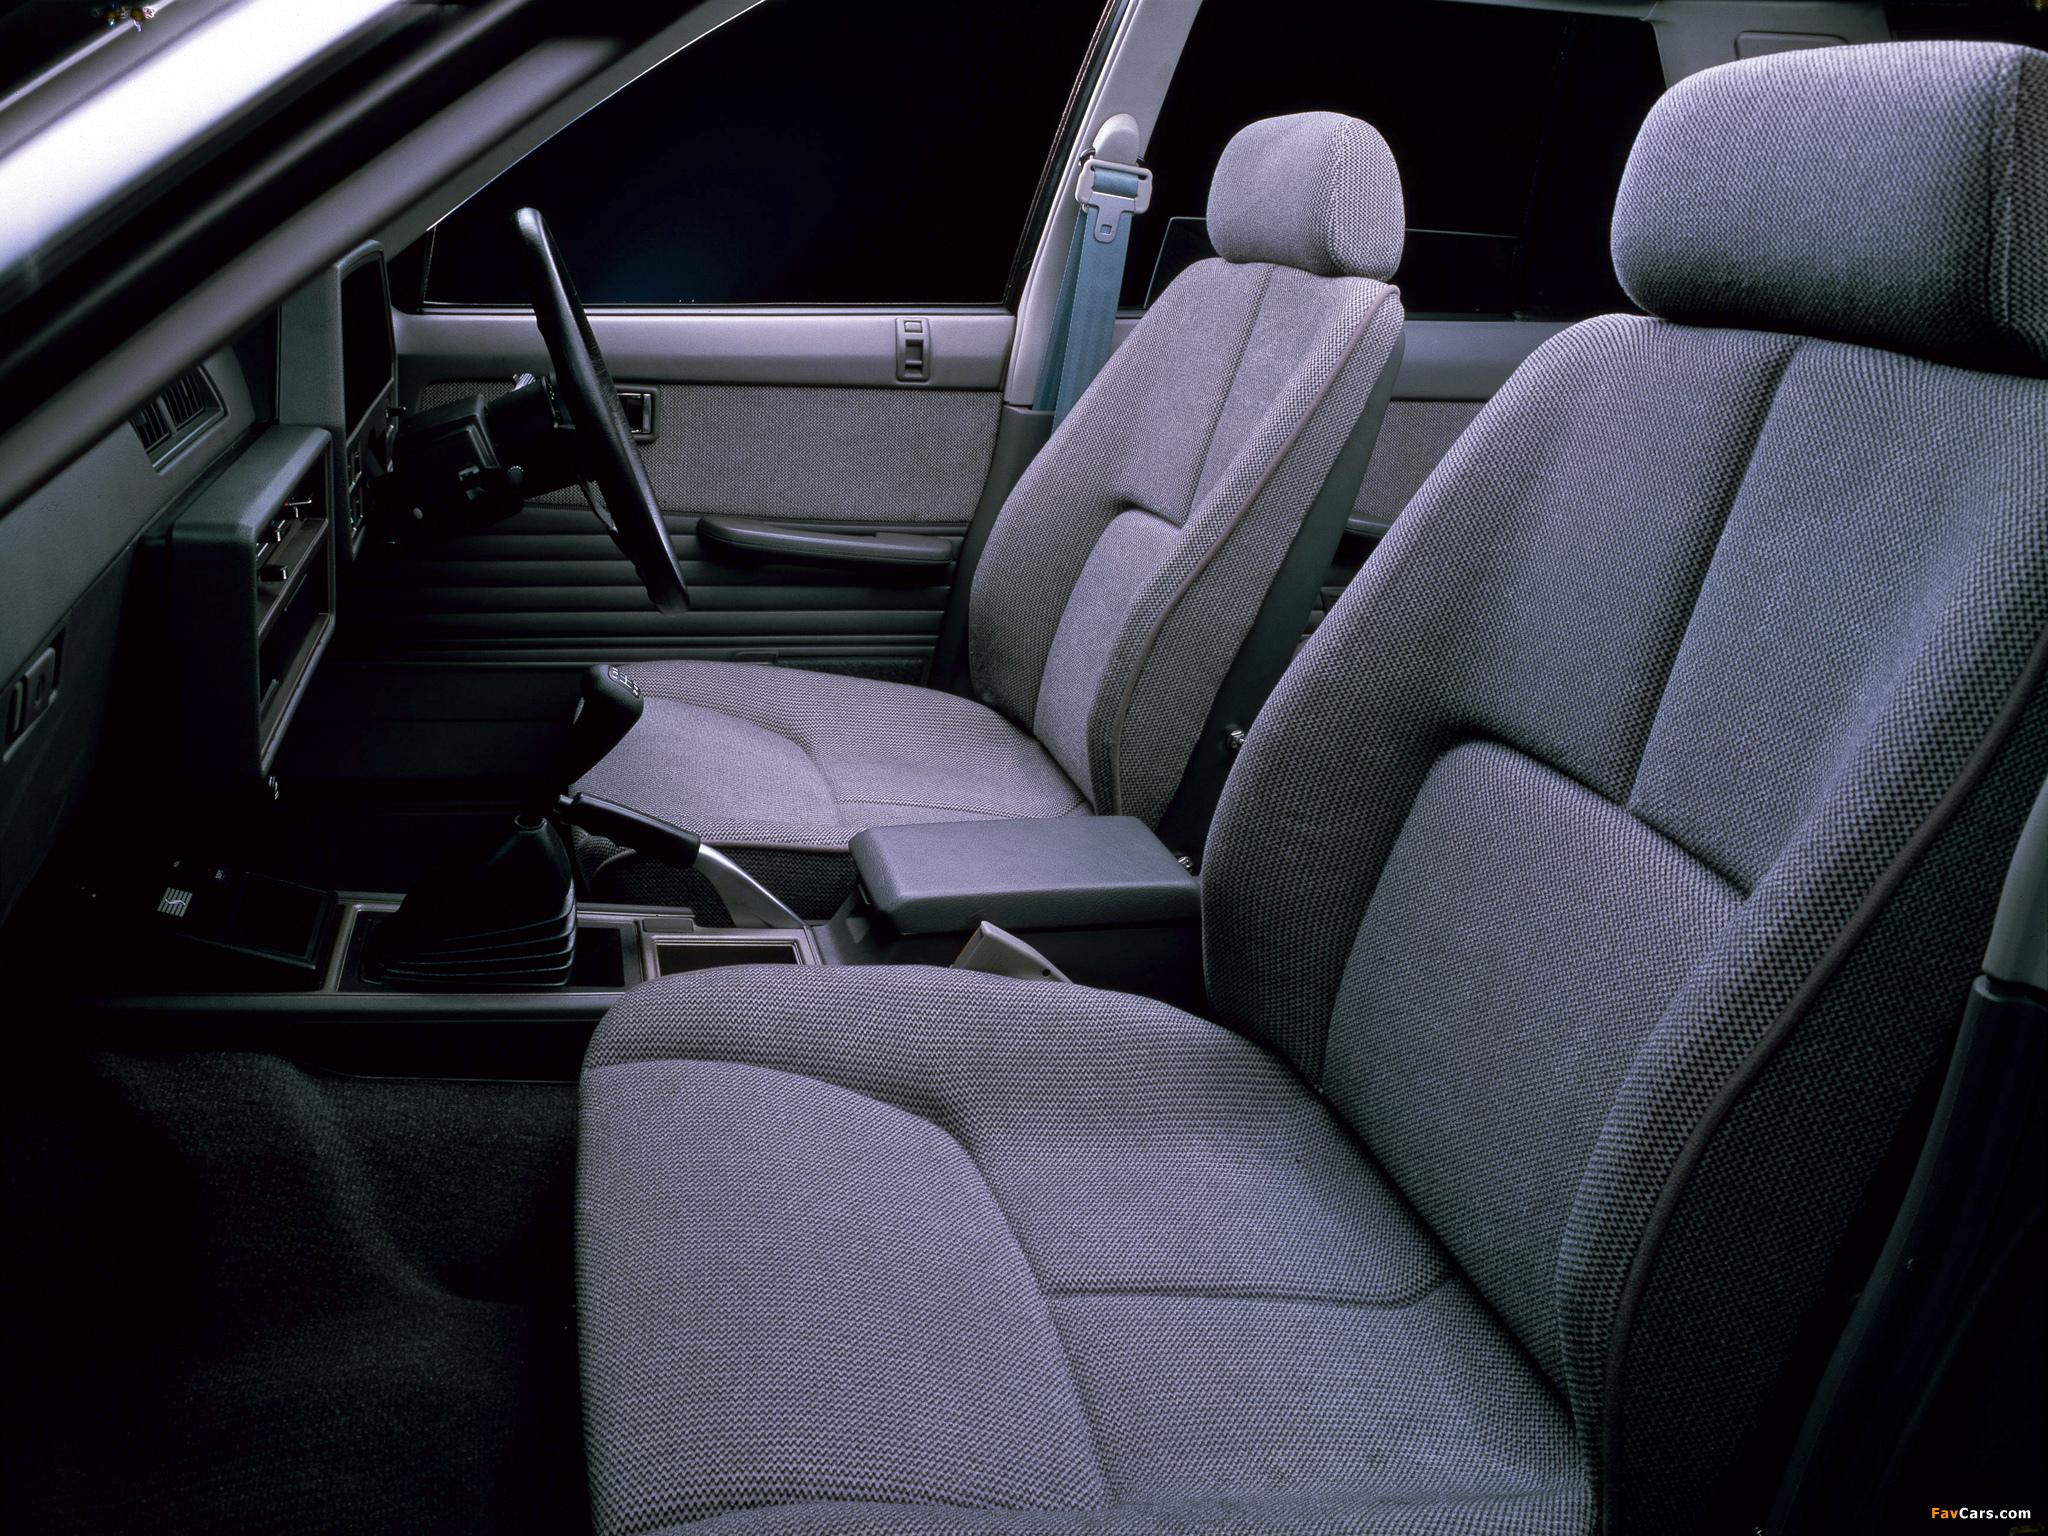 Nissan Skyline 2000 Turbo RS Sedan (DR30JFT) 1983 photos (2048 x 1536)